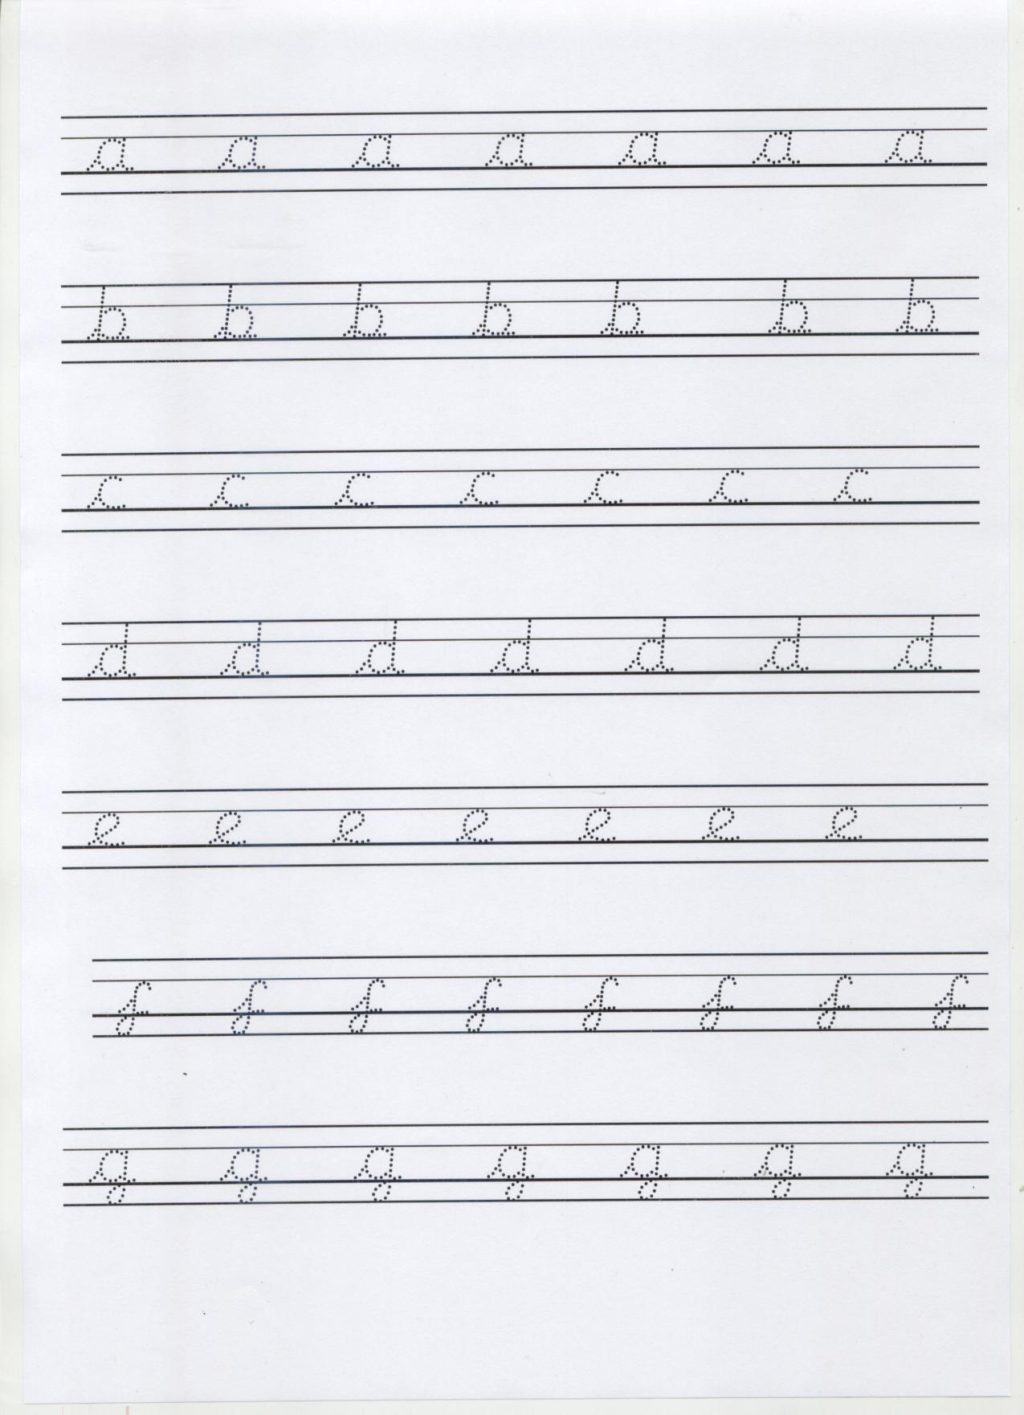 Worksheet ~ Cursive Handwriting Practice Sheets 279171